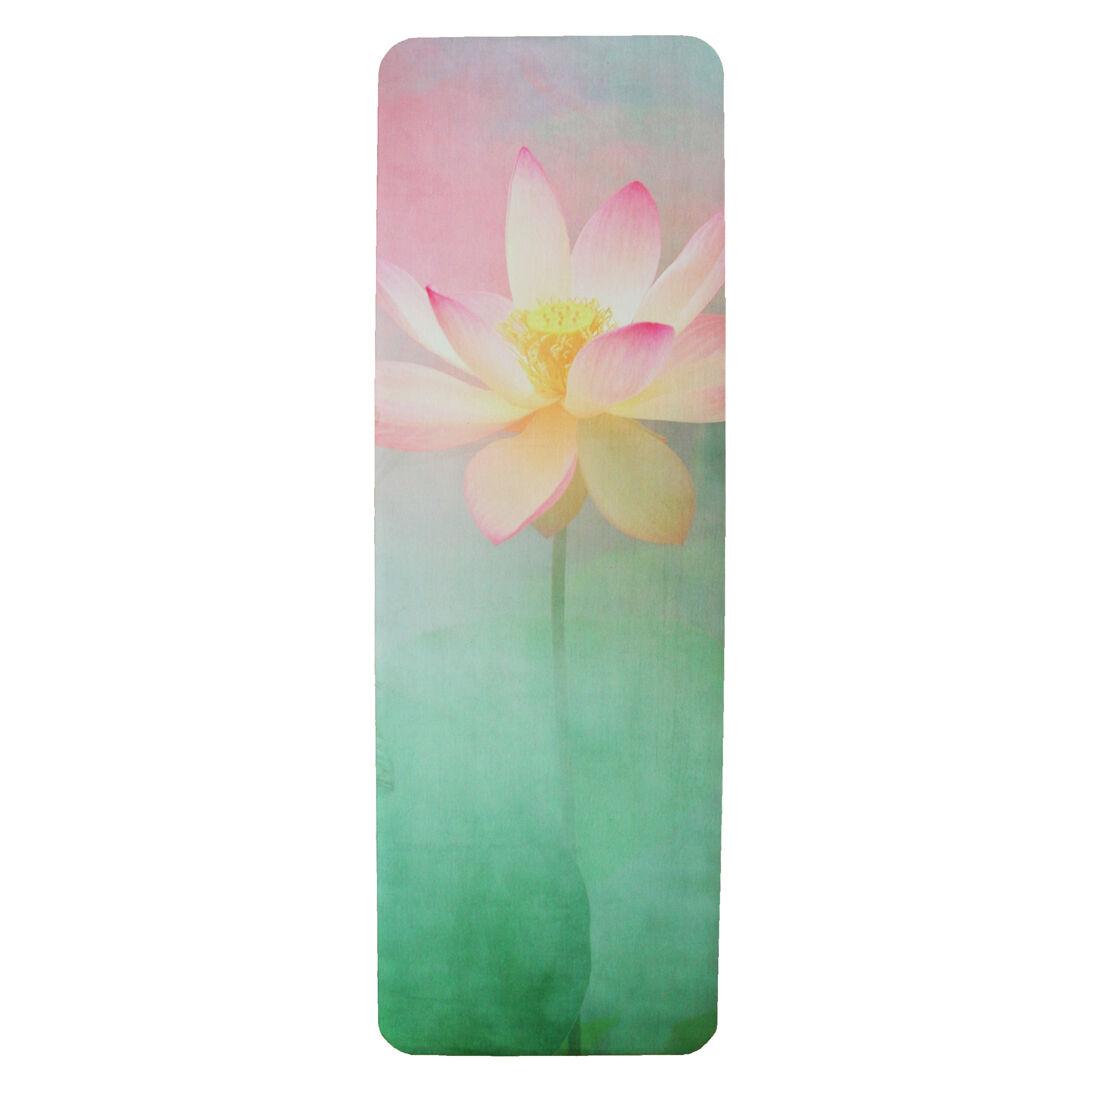 Premium Yoga Mat – Supreme Lotus, Eco Friendly